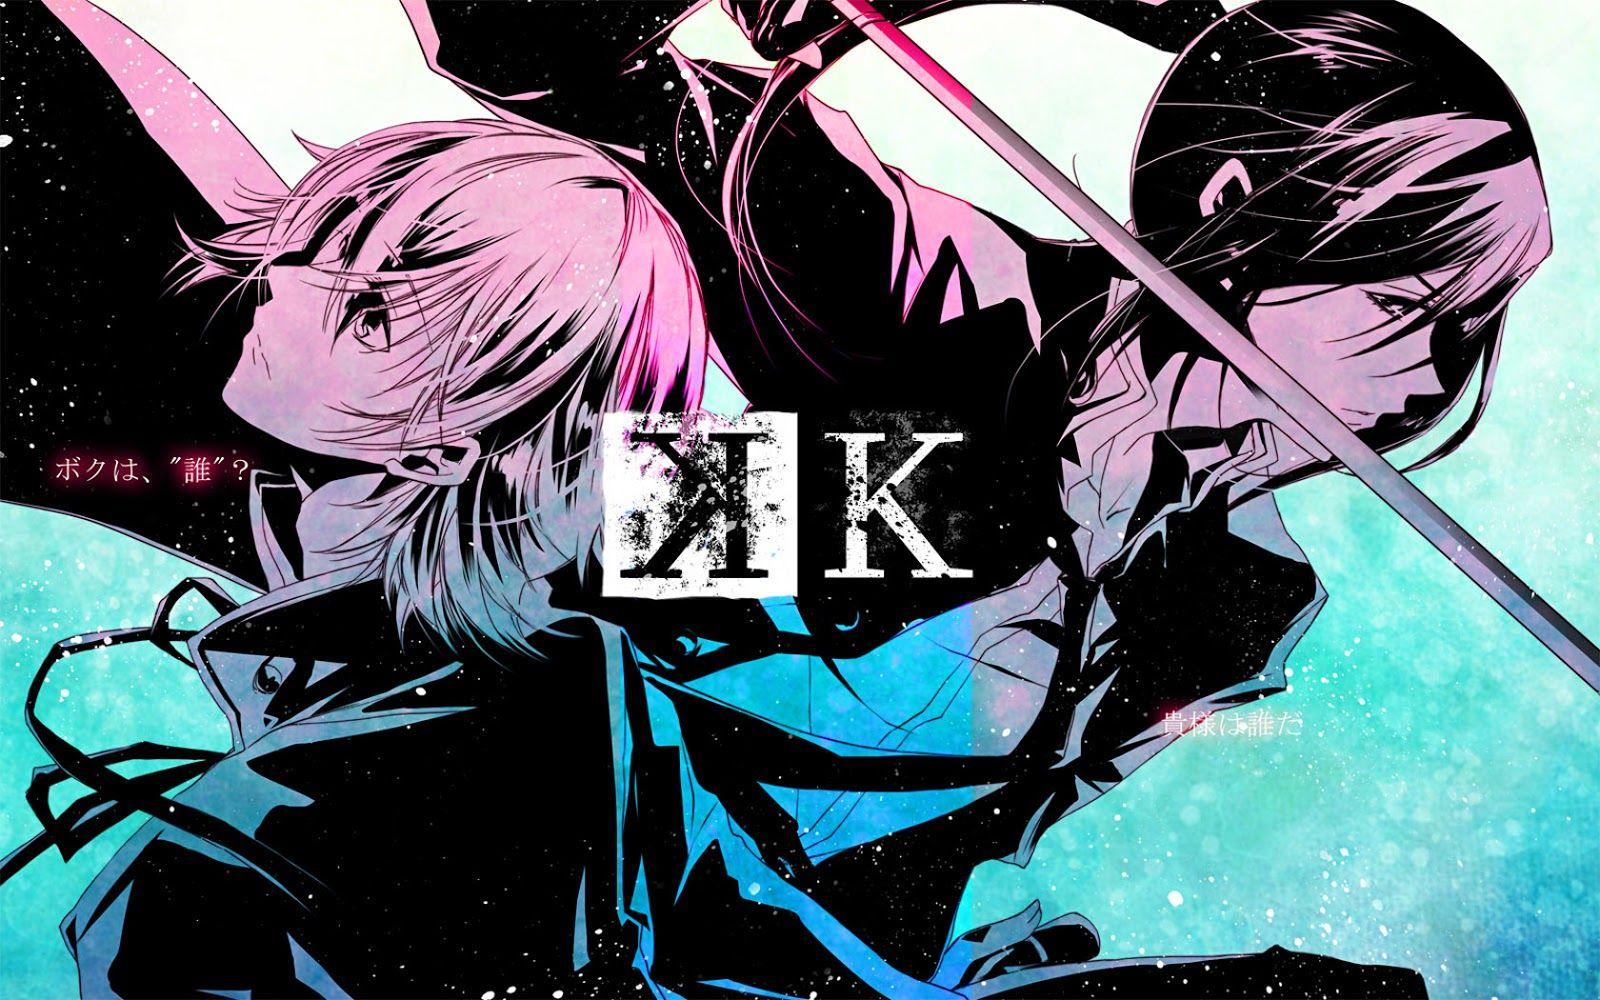 Project Yashiro Isana Yatogami Kuroh Anime Sword Katana Hd Wallpaper K Project K Project Anime Anime Shows